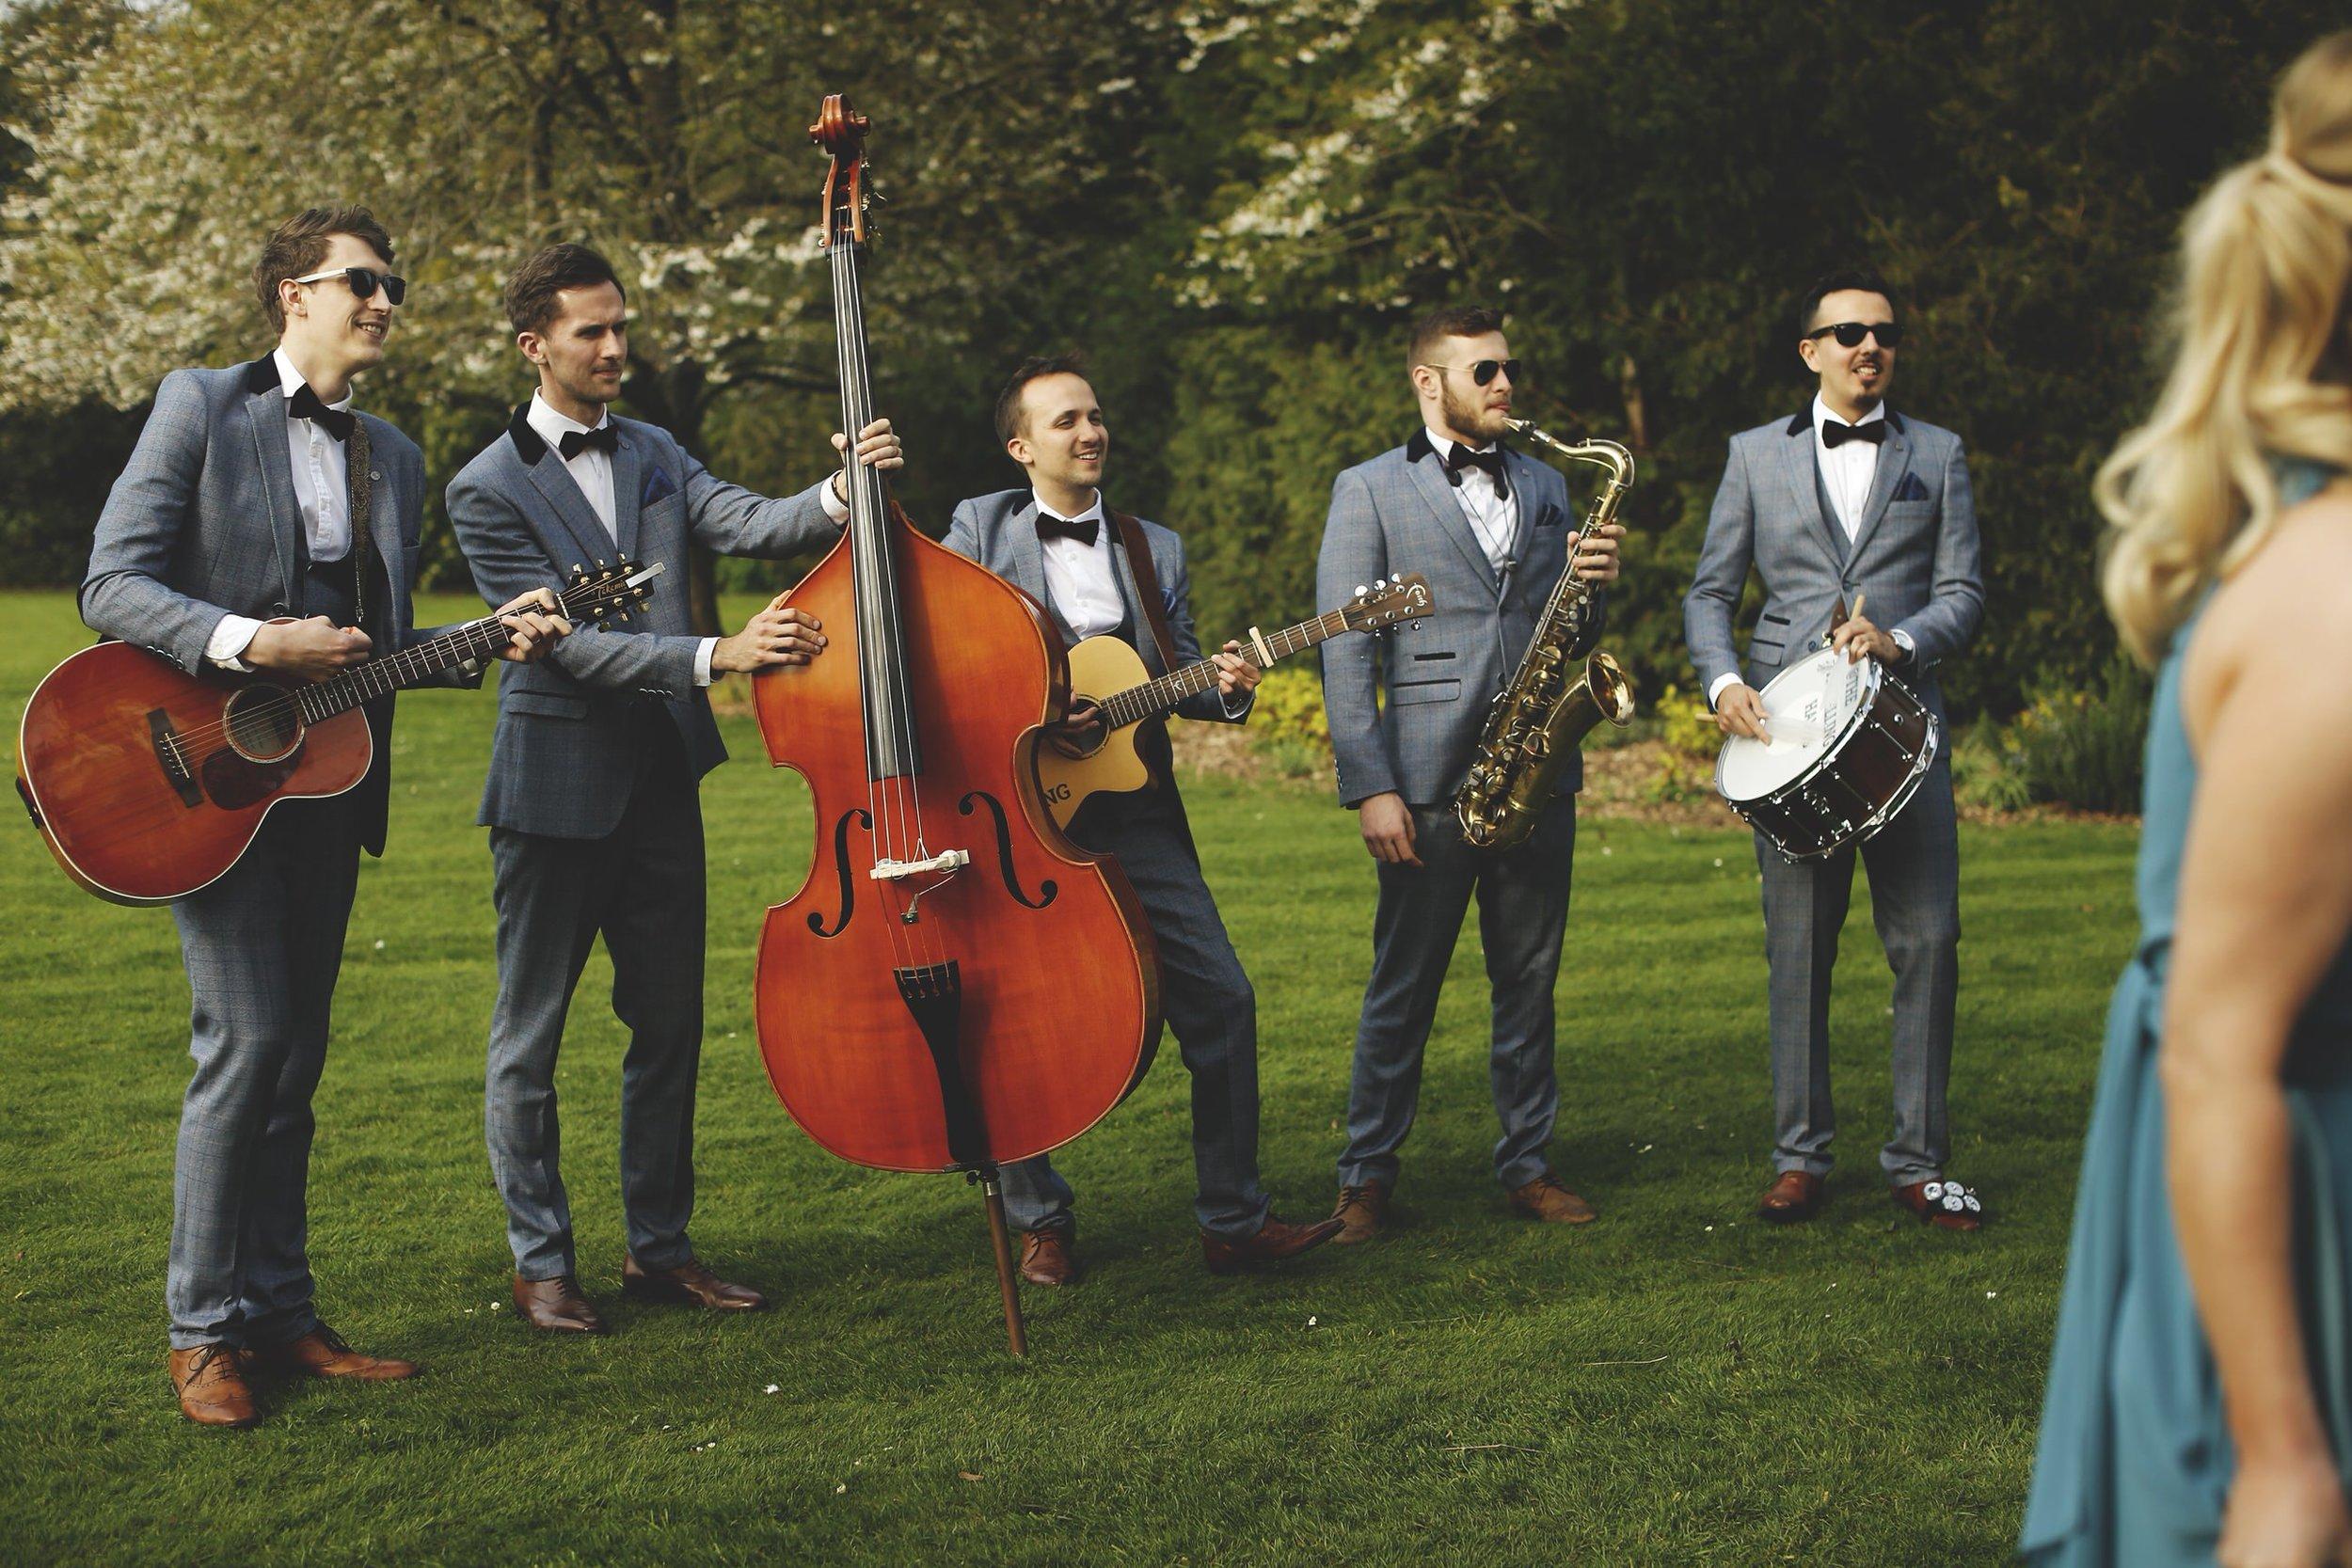 brettharkness-luxury-wedding-photographer-uk_0031.jpg